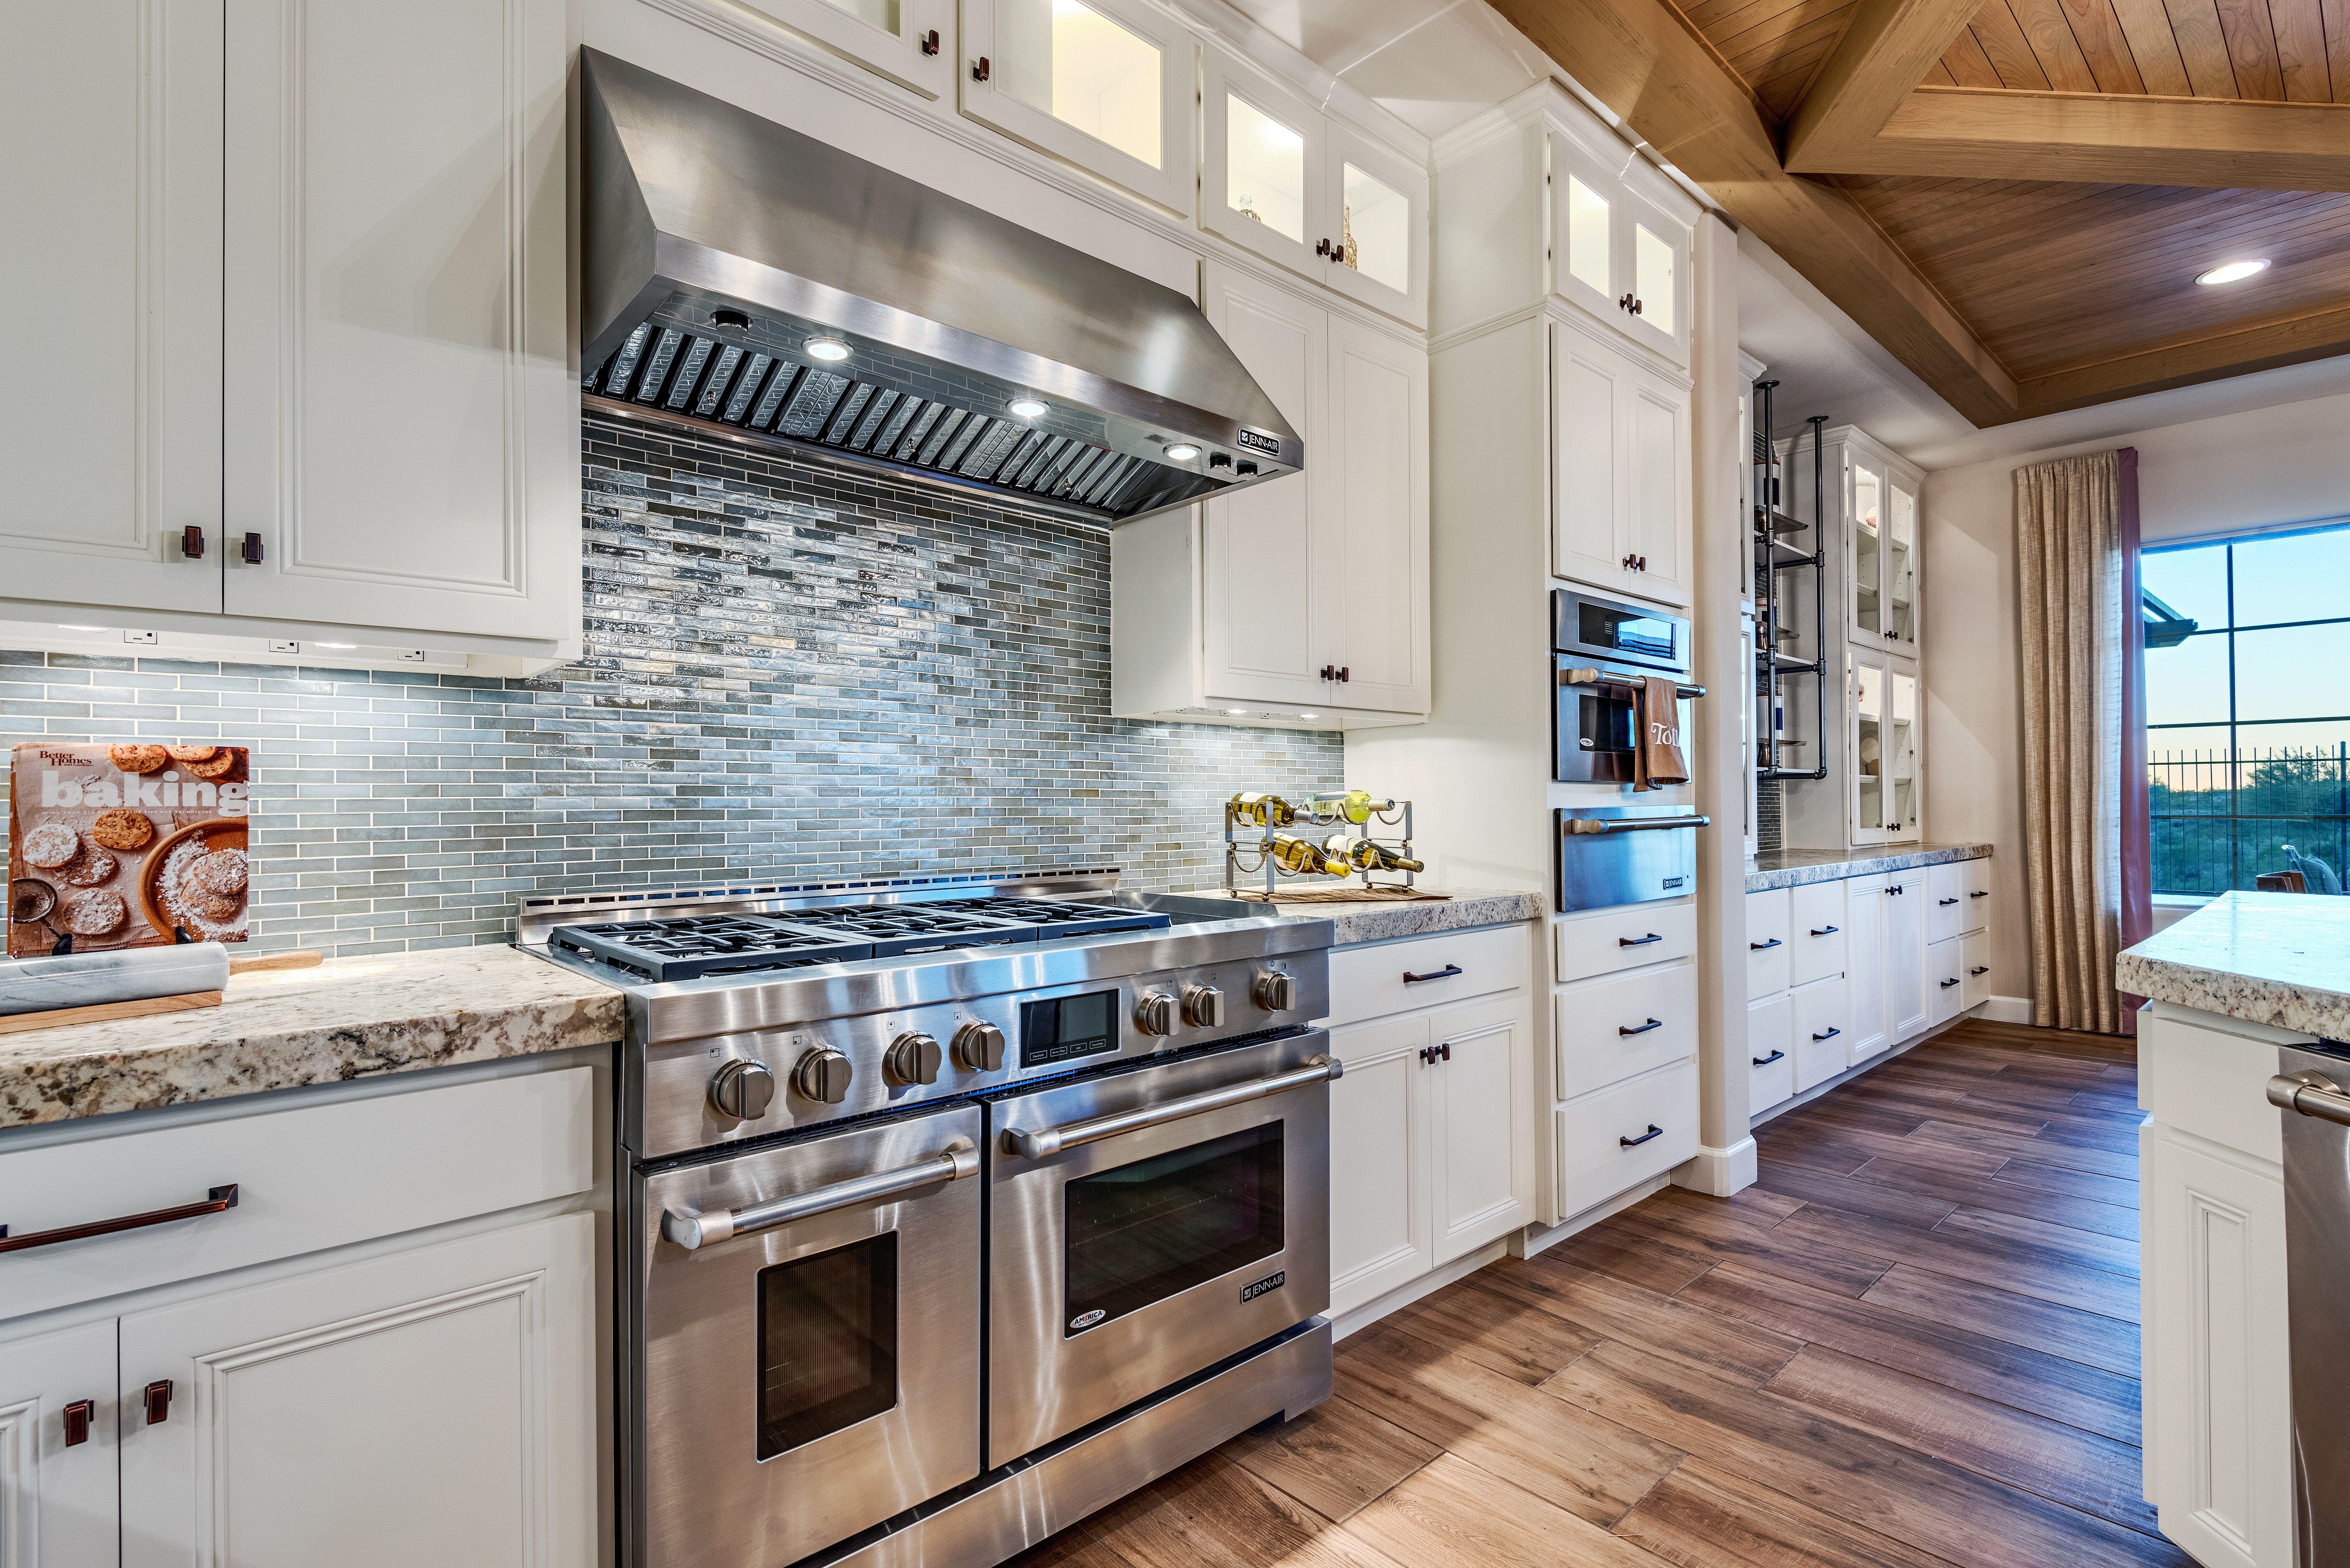 Arizona New Homes For Sale In Toll Brothers Luxury Communities Interior Design Kitchen Home Kitchens Kitchen Interior